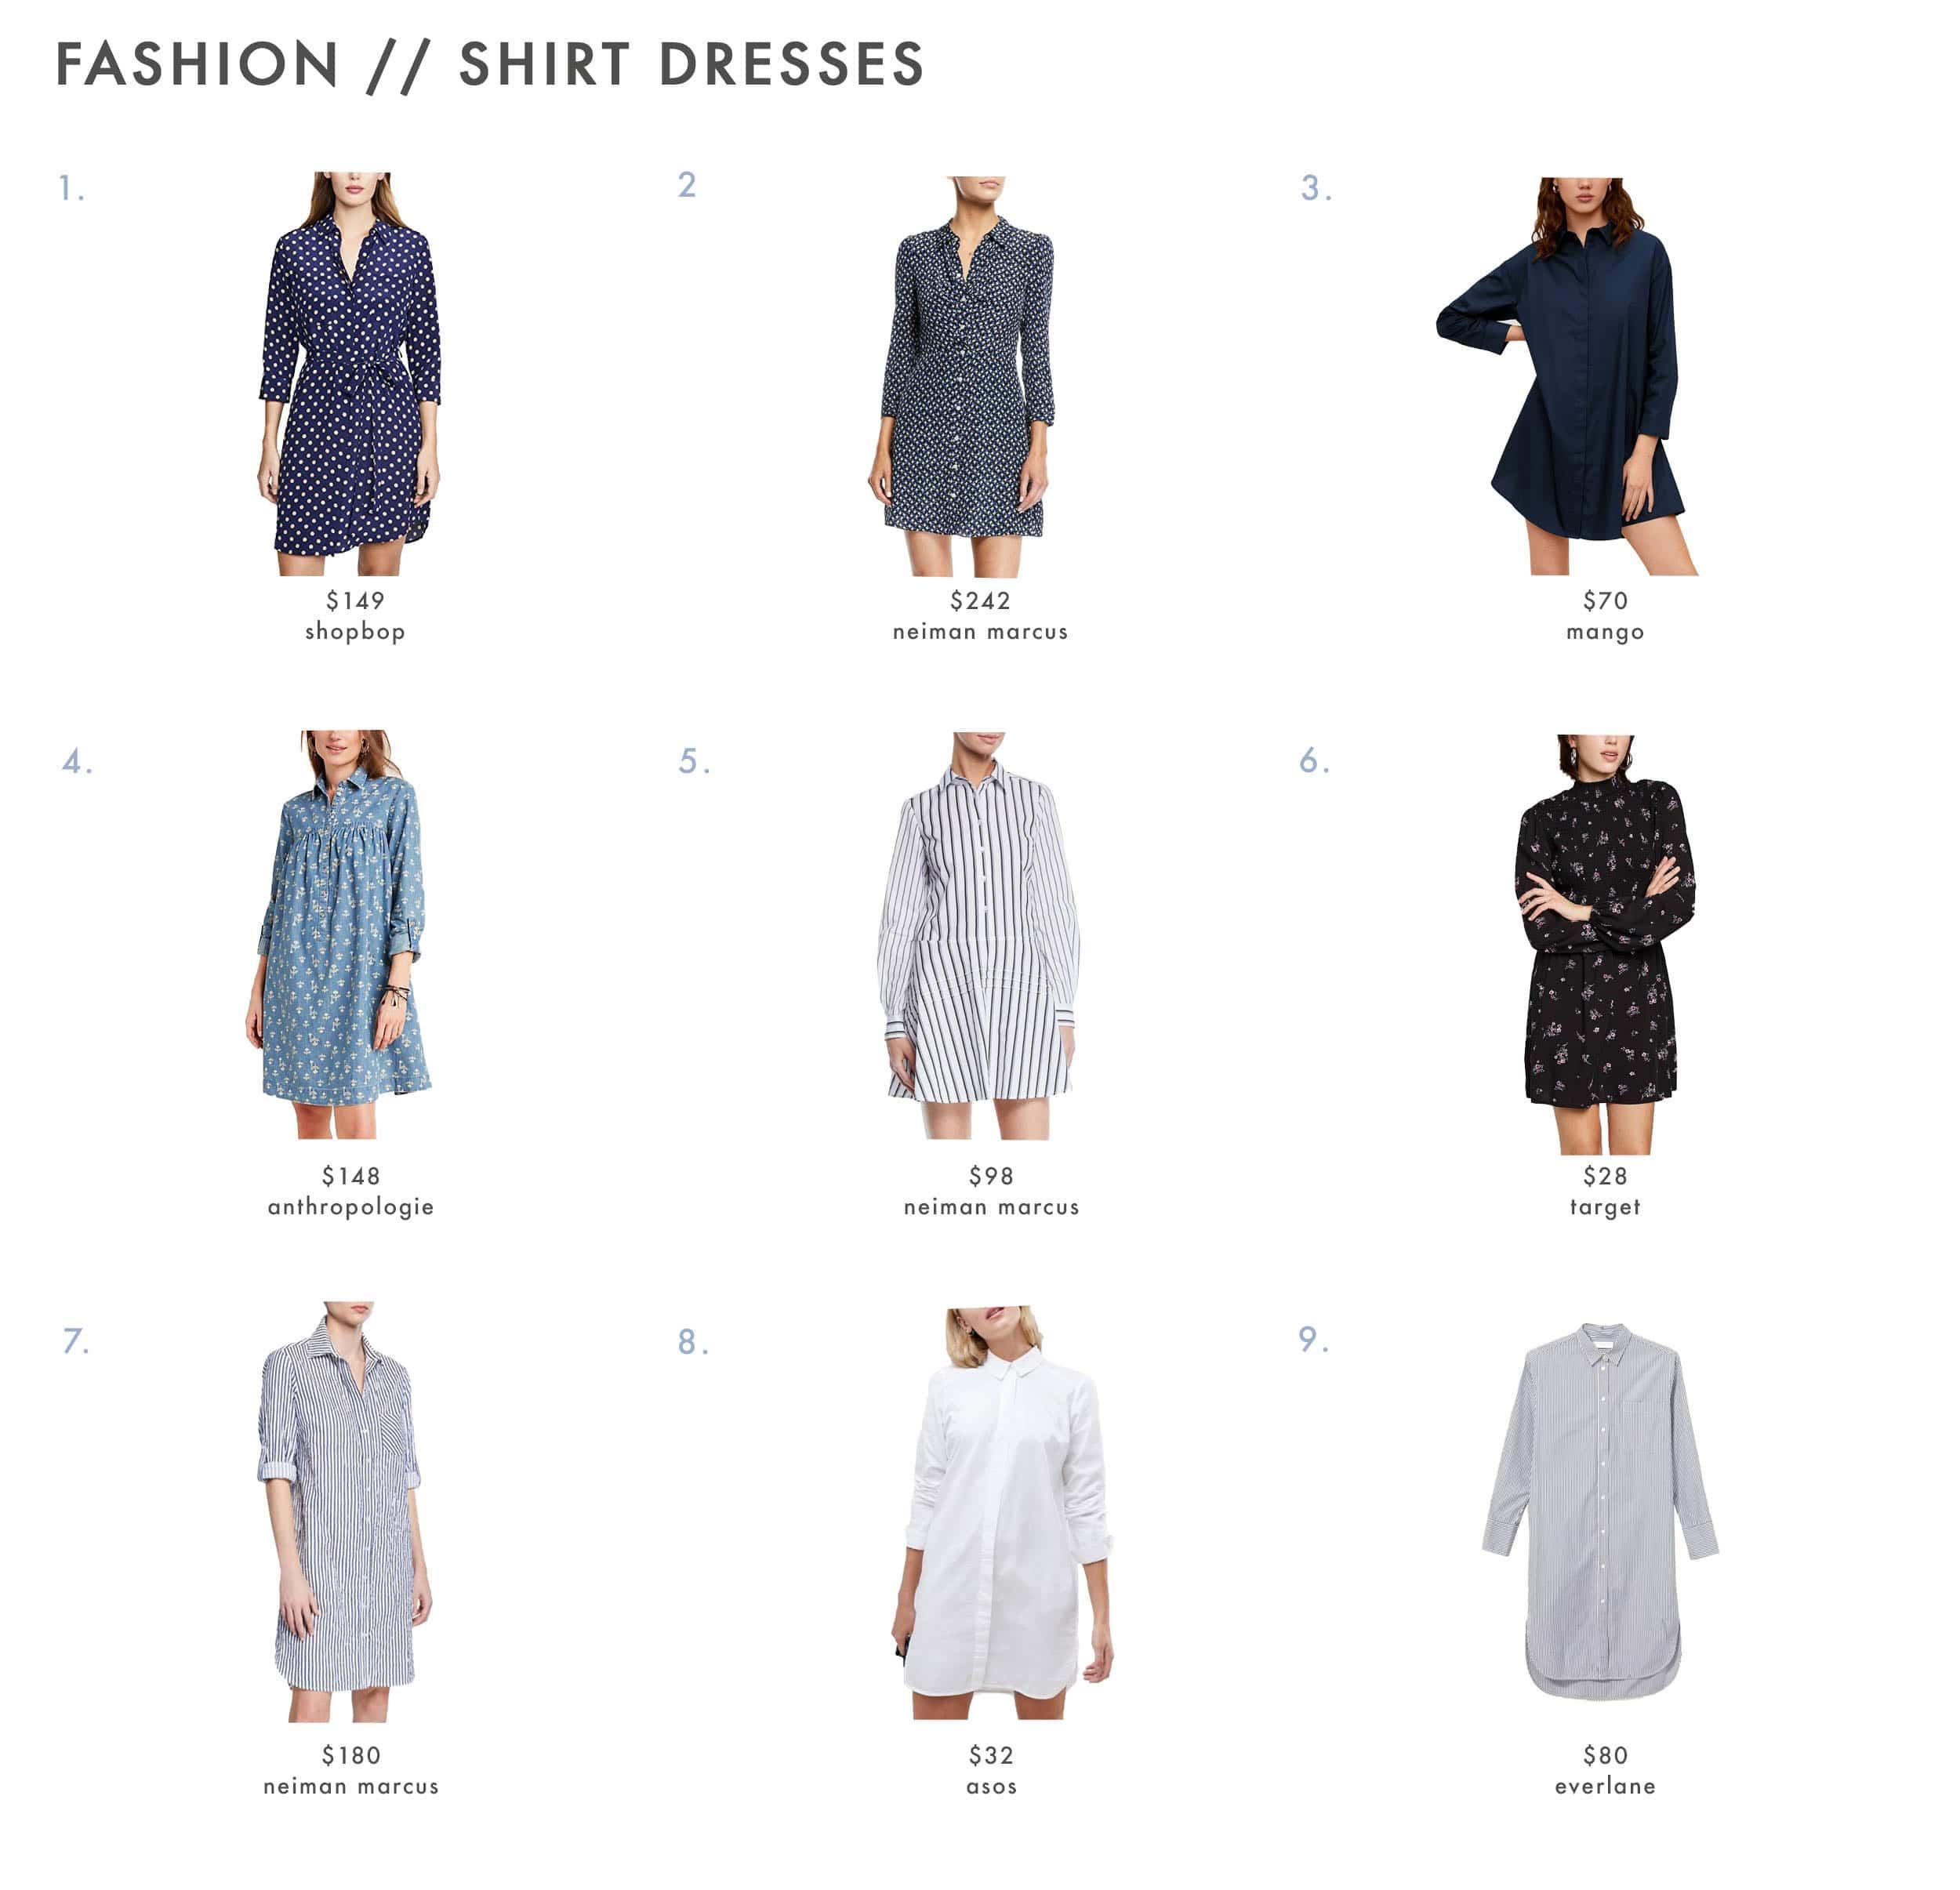 emily henderson sustainable fashion11